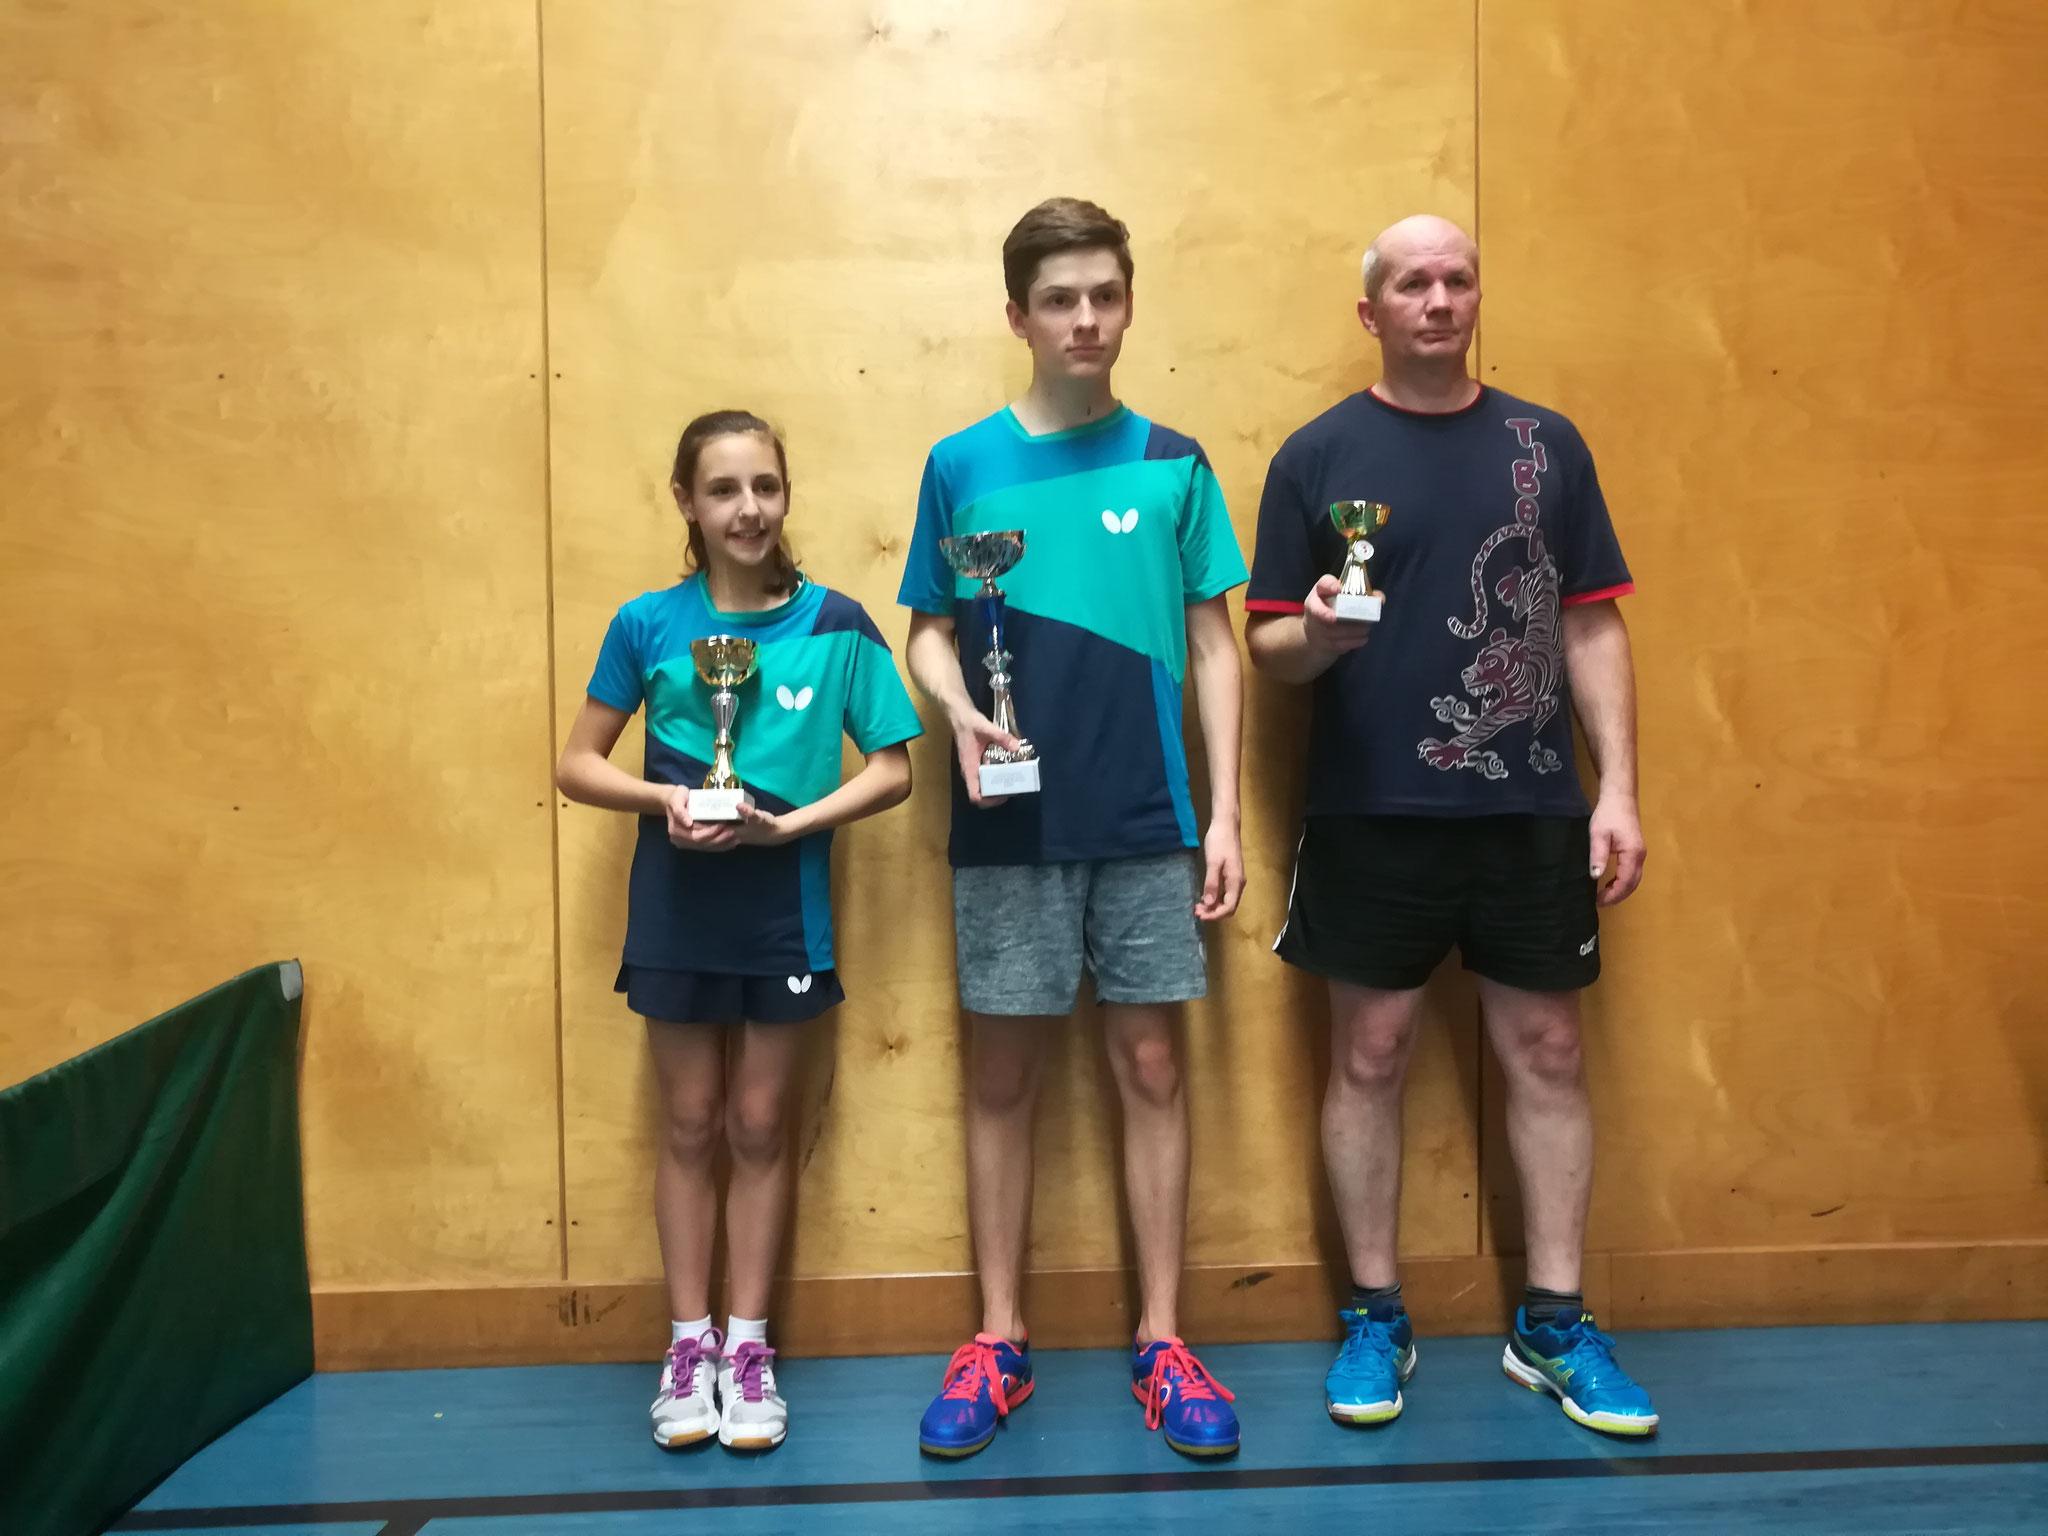 Siegerfoto Bewerb E: v.l.n.r. Lara Taborski (SSTO) (Platz 2), David Brandl (SSTO) (Sieger), Endre Pelsöczi (URAP) (Platz 3)